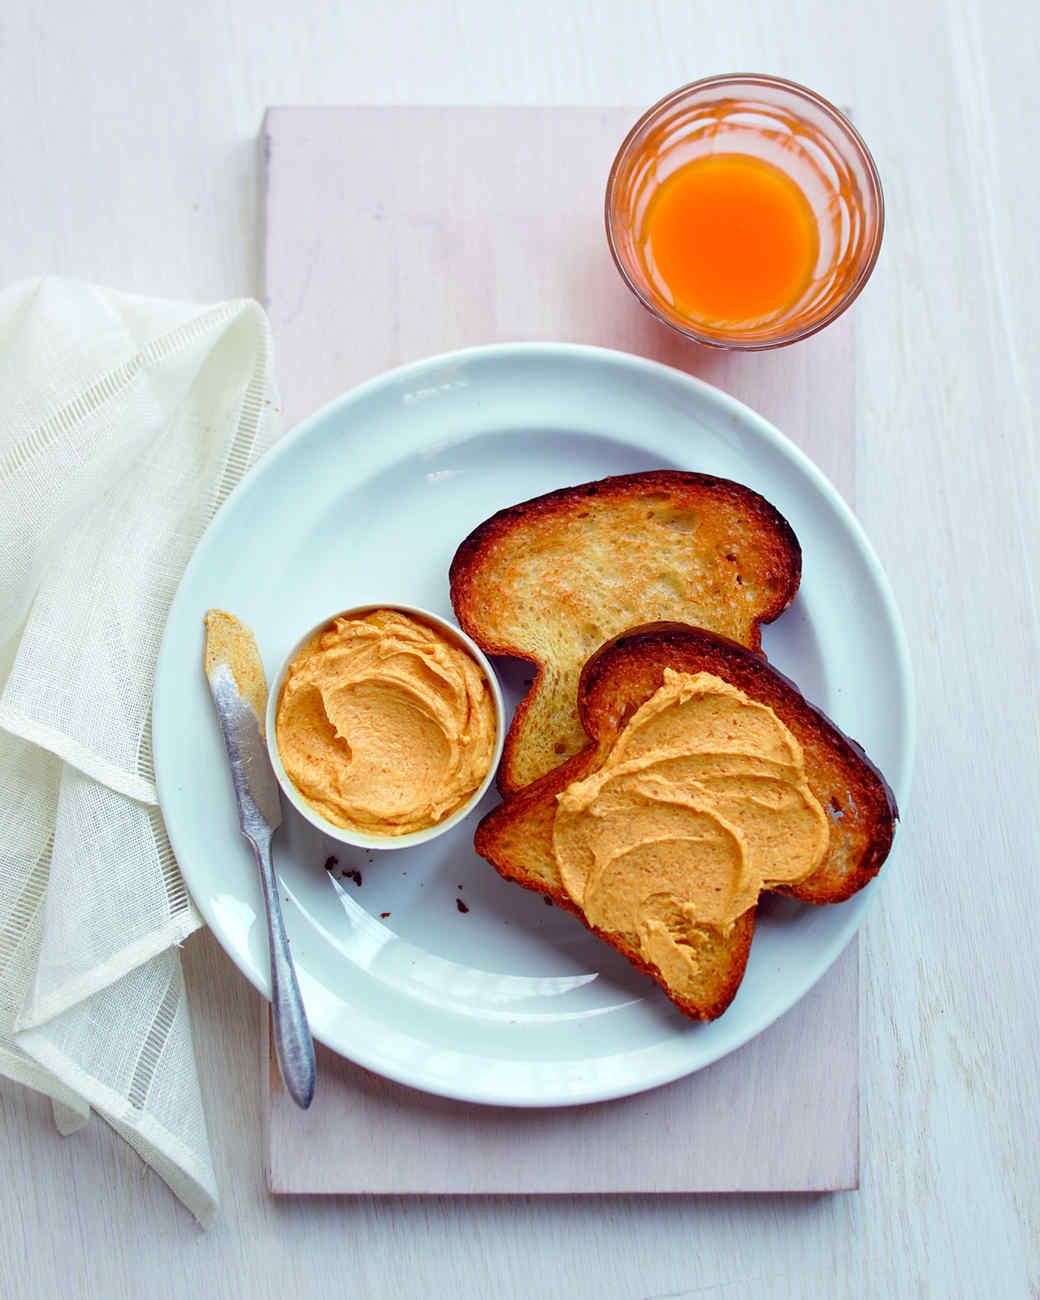 good-things-toast-mld105568.jpg